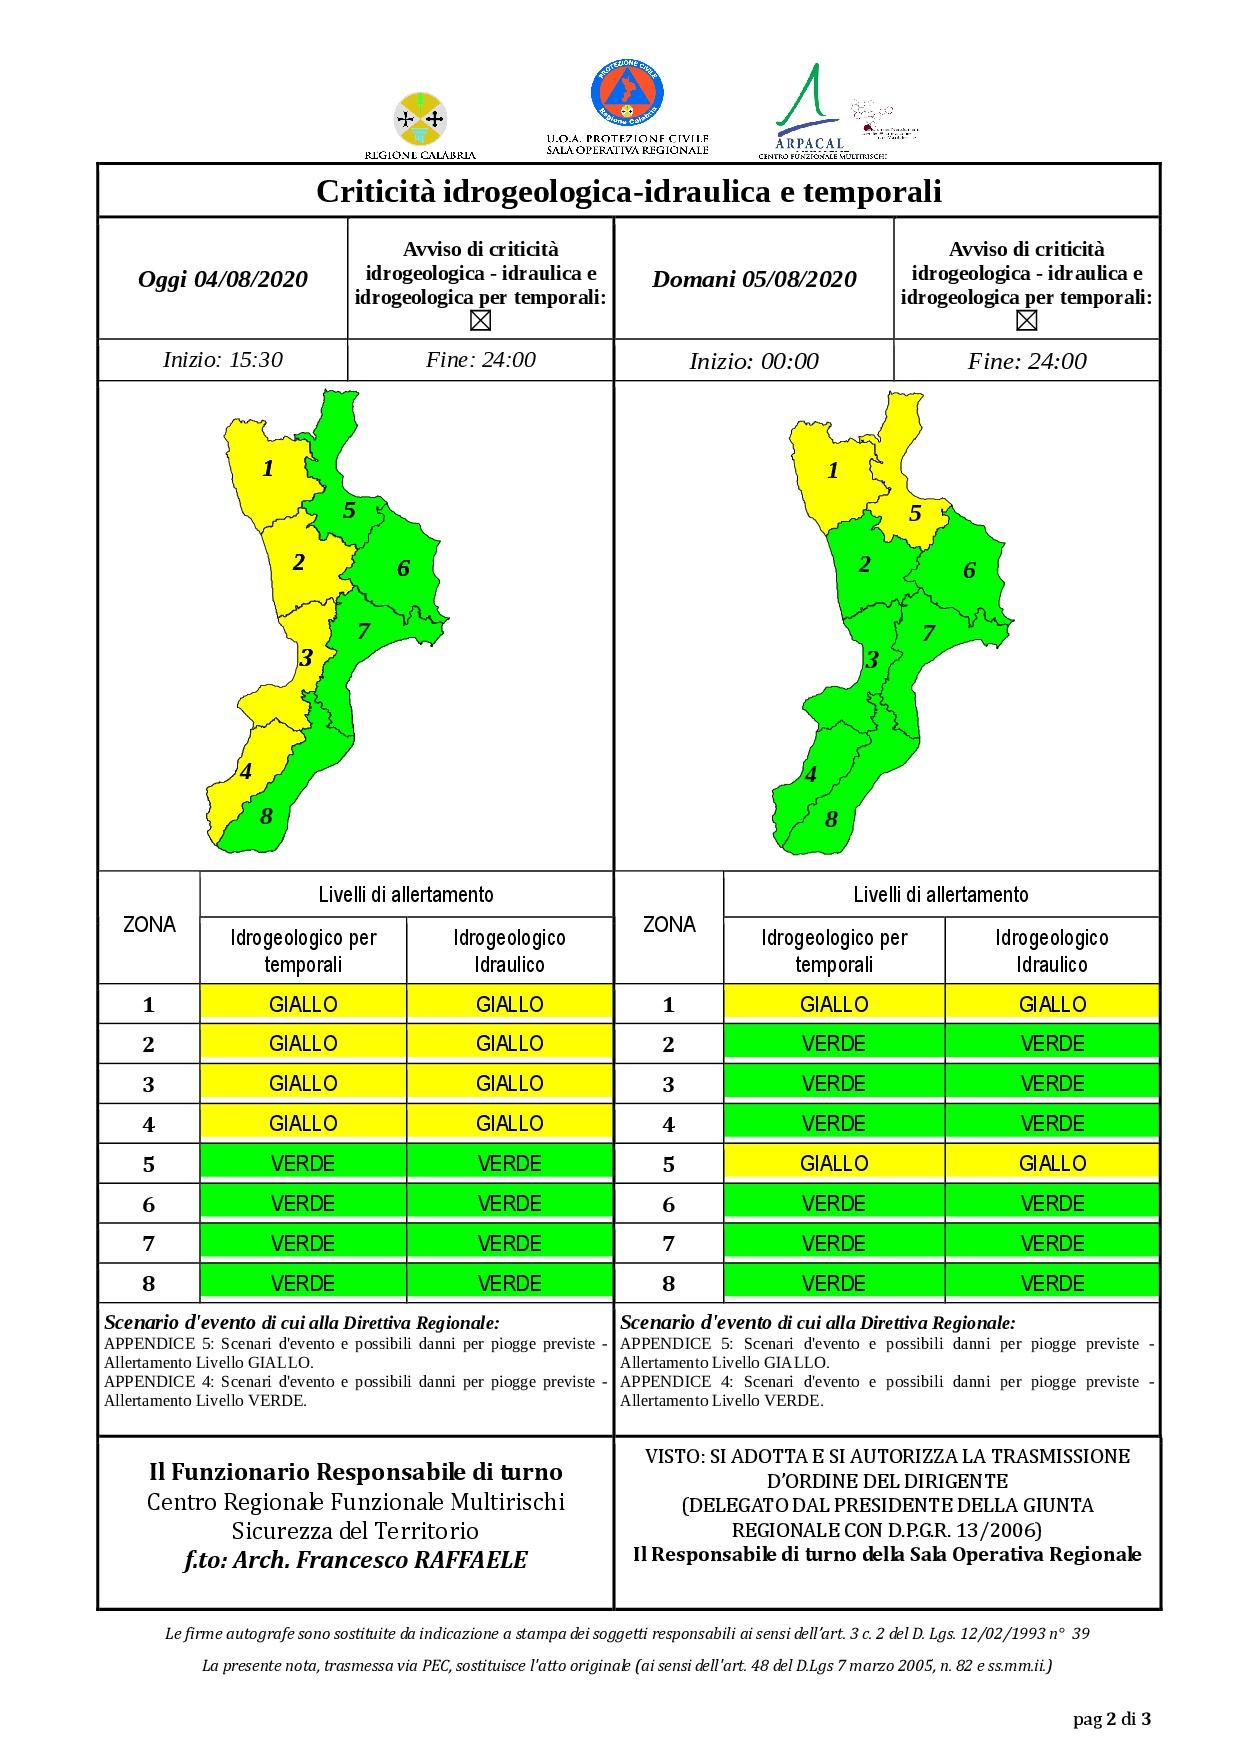 Criticità idrogeologica-idraulica e temporali in Calabria 04-08-2020